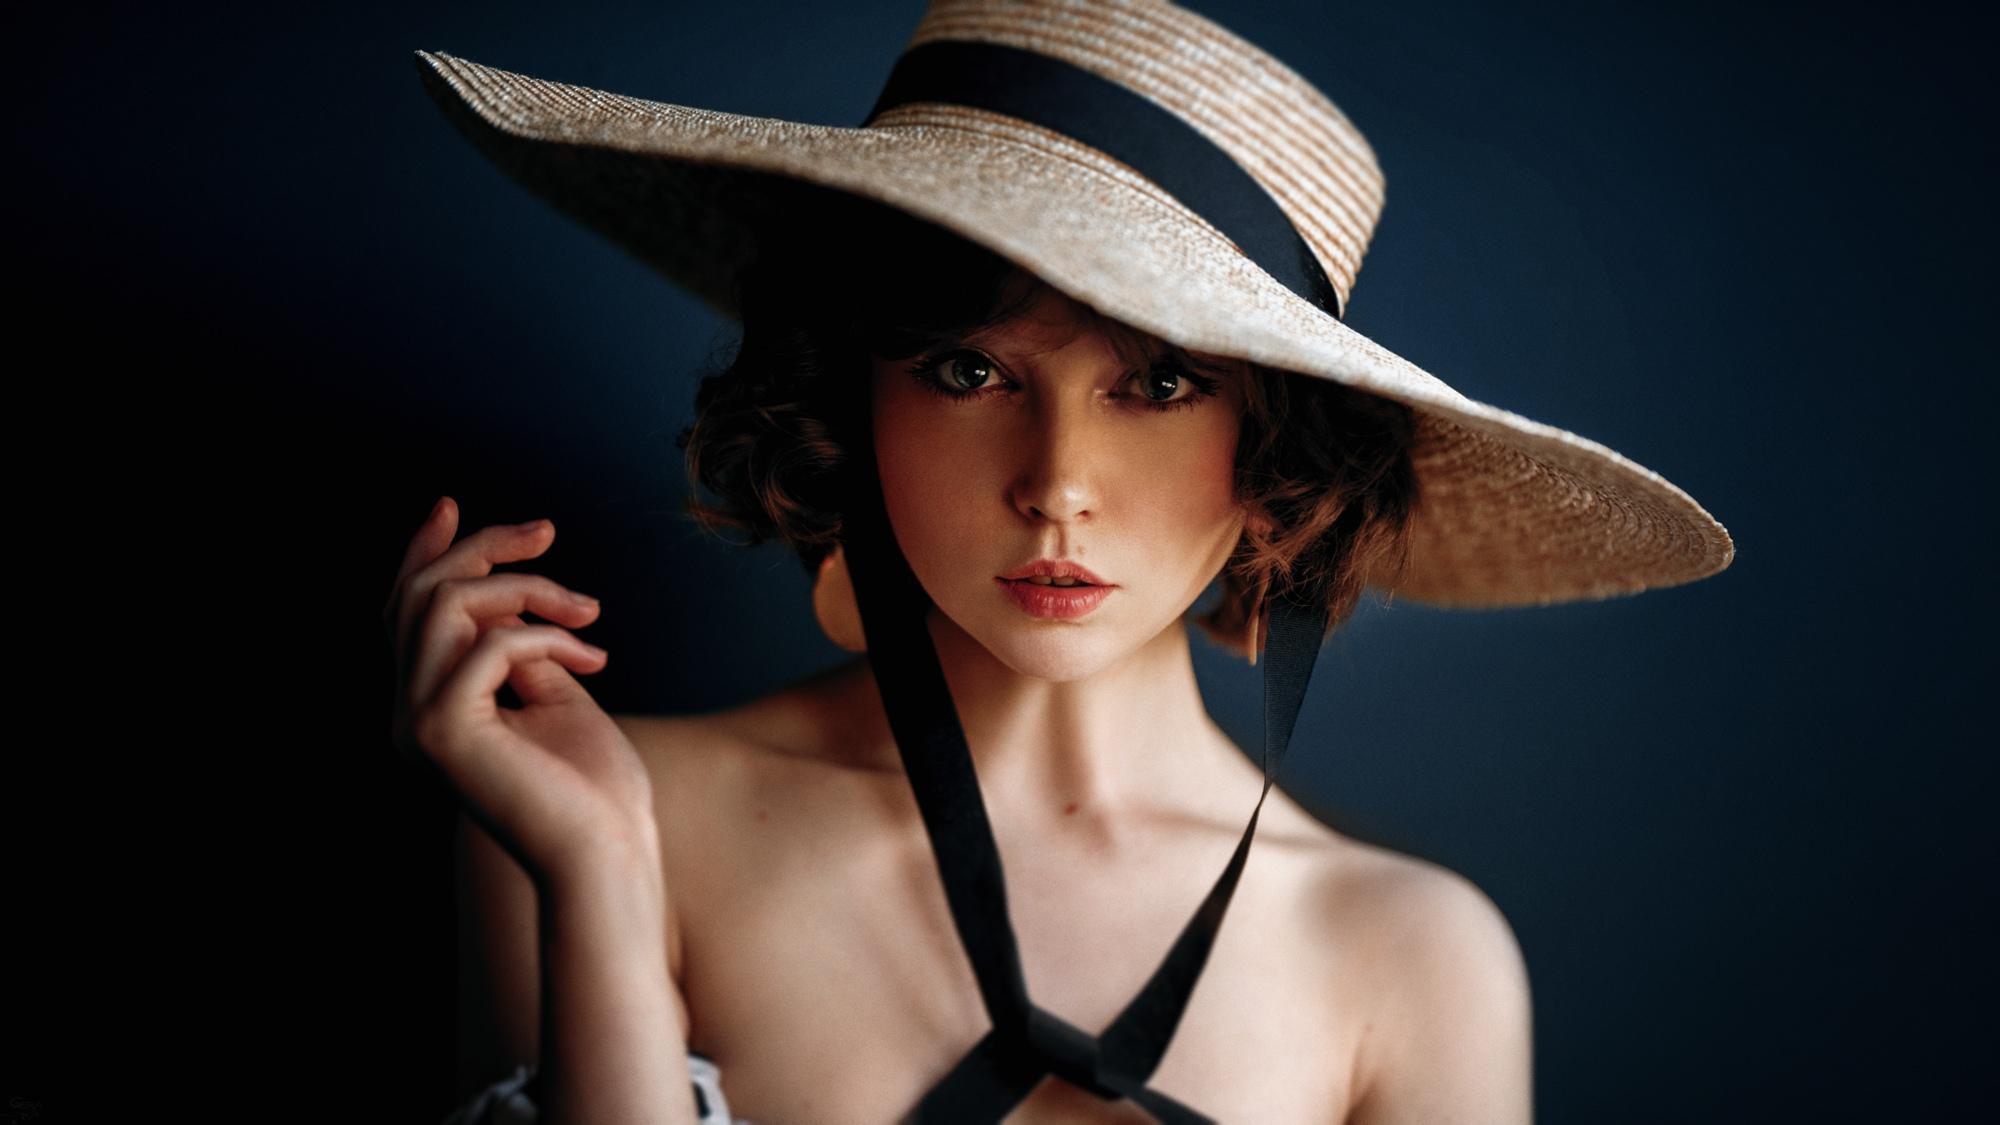 People 2000x1125 Olya Pushkina women model brunette portrait looking at viewer bokeh bare shoulders women with hats hat dark background face Georgy Chernyadyev